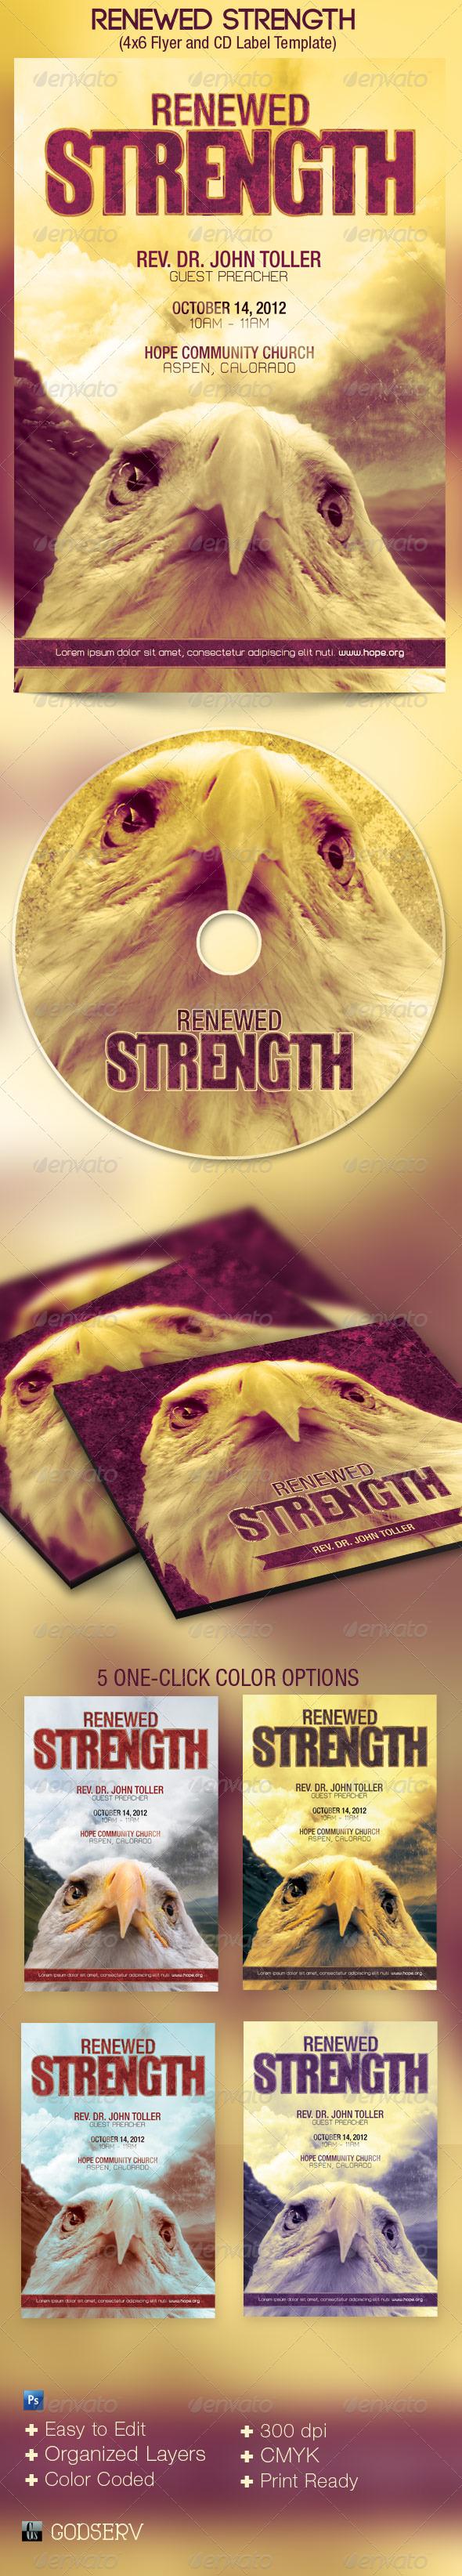 Renewed Strength Church Flyer CD Template - Church Flyers